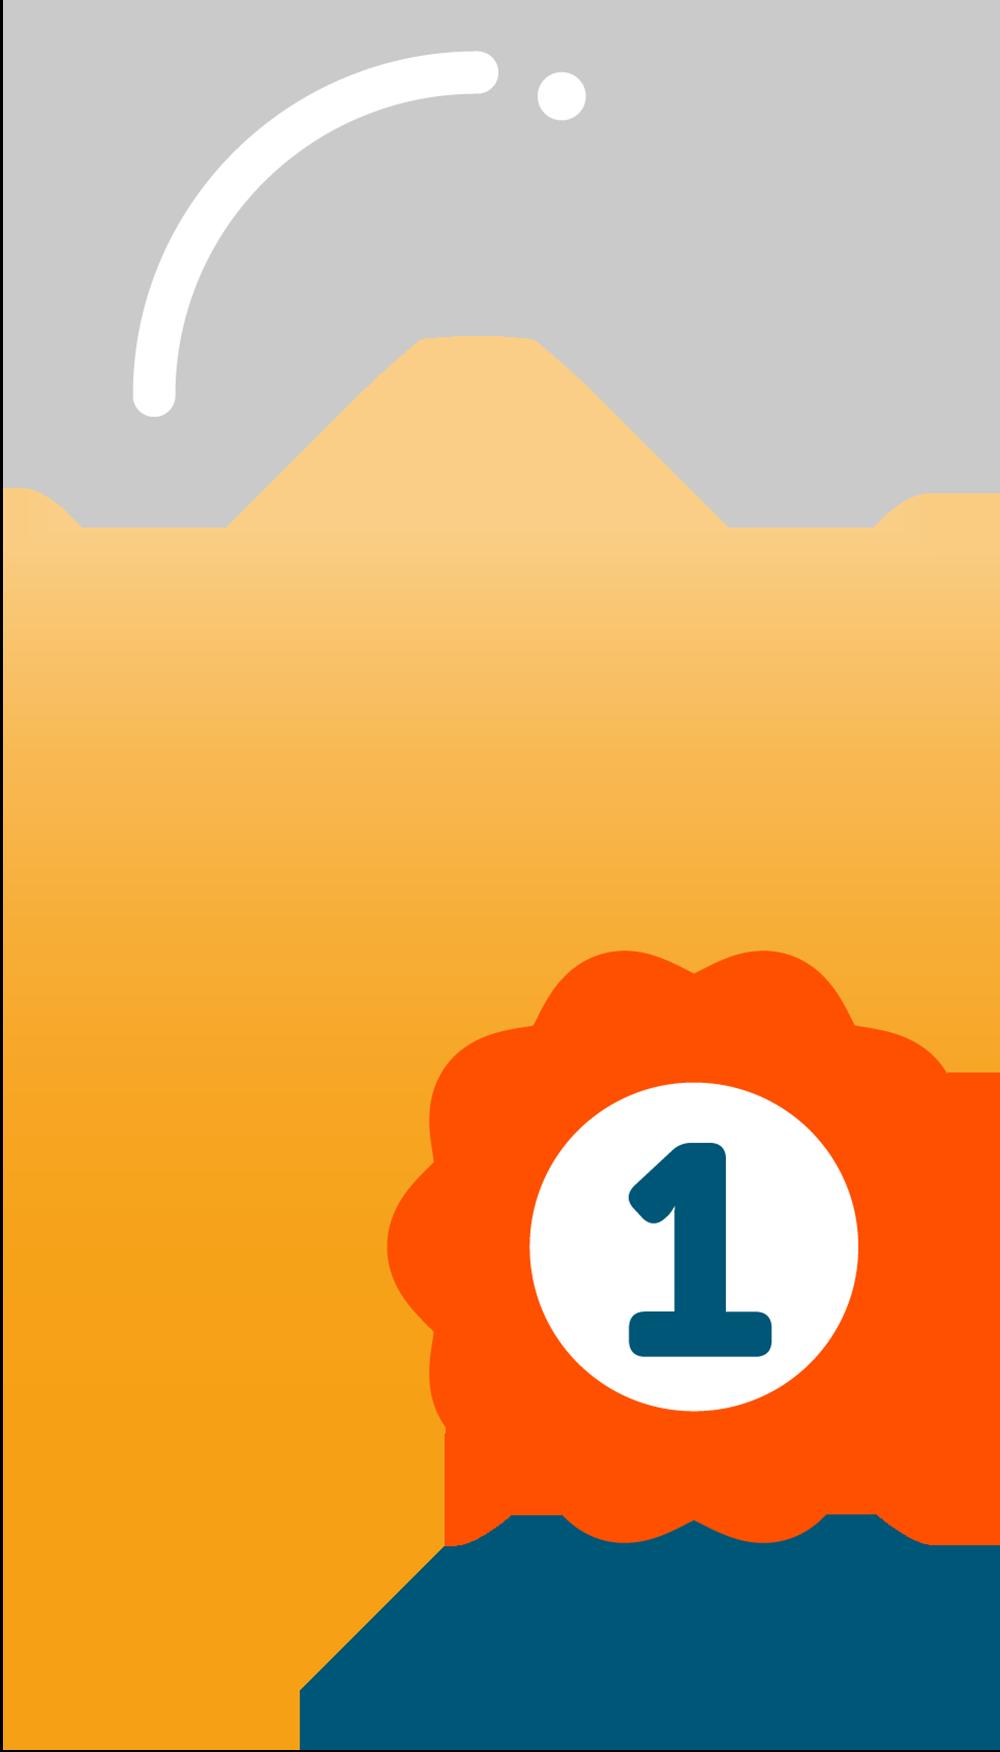 Lock clipart data security. Yoozoom telecom ltd